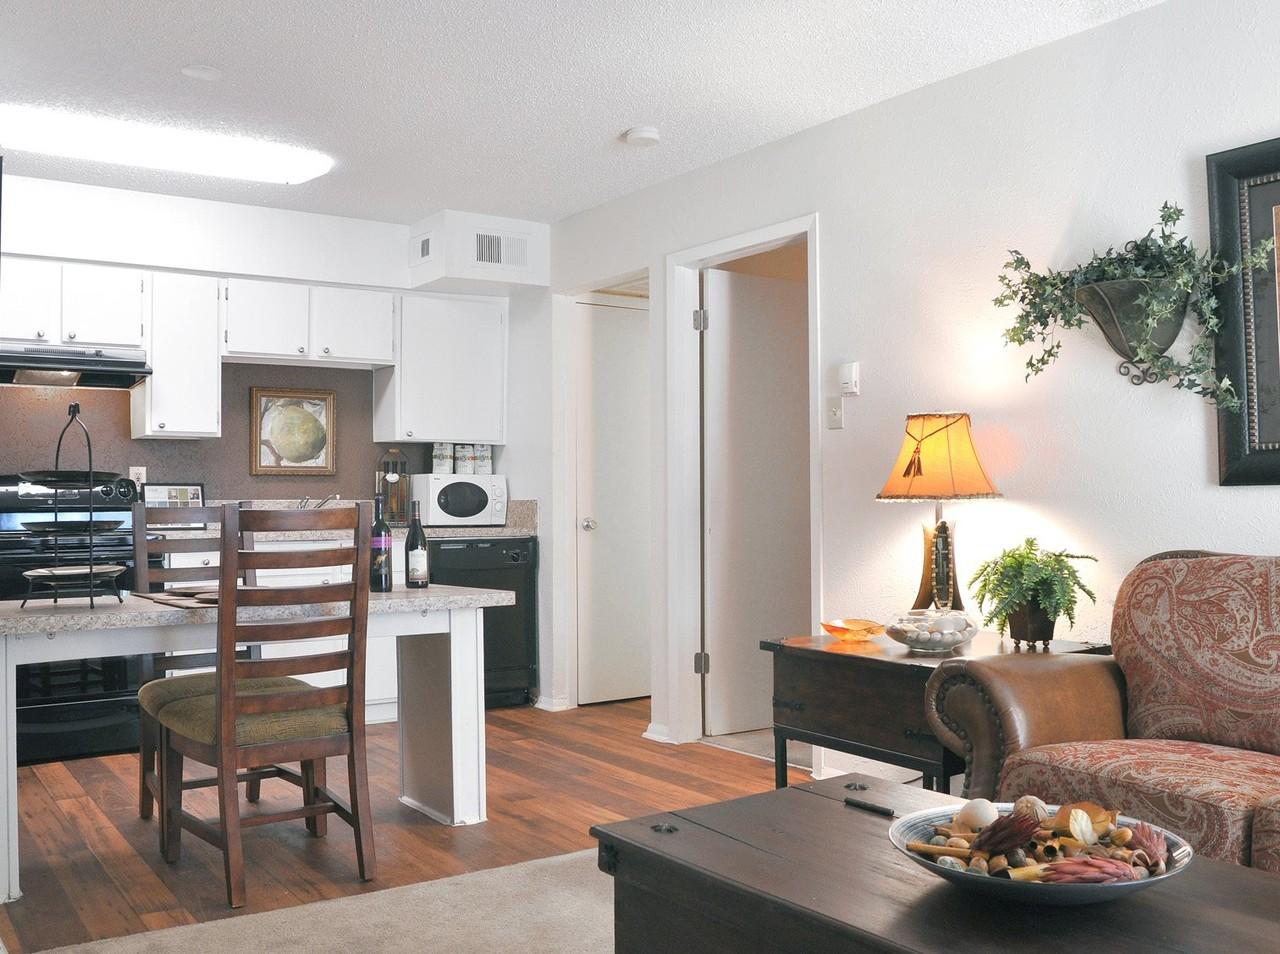 Brooklyn At 9670 · Apartments For Rent. Dallas Apartments